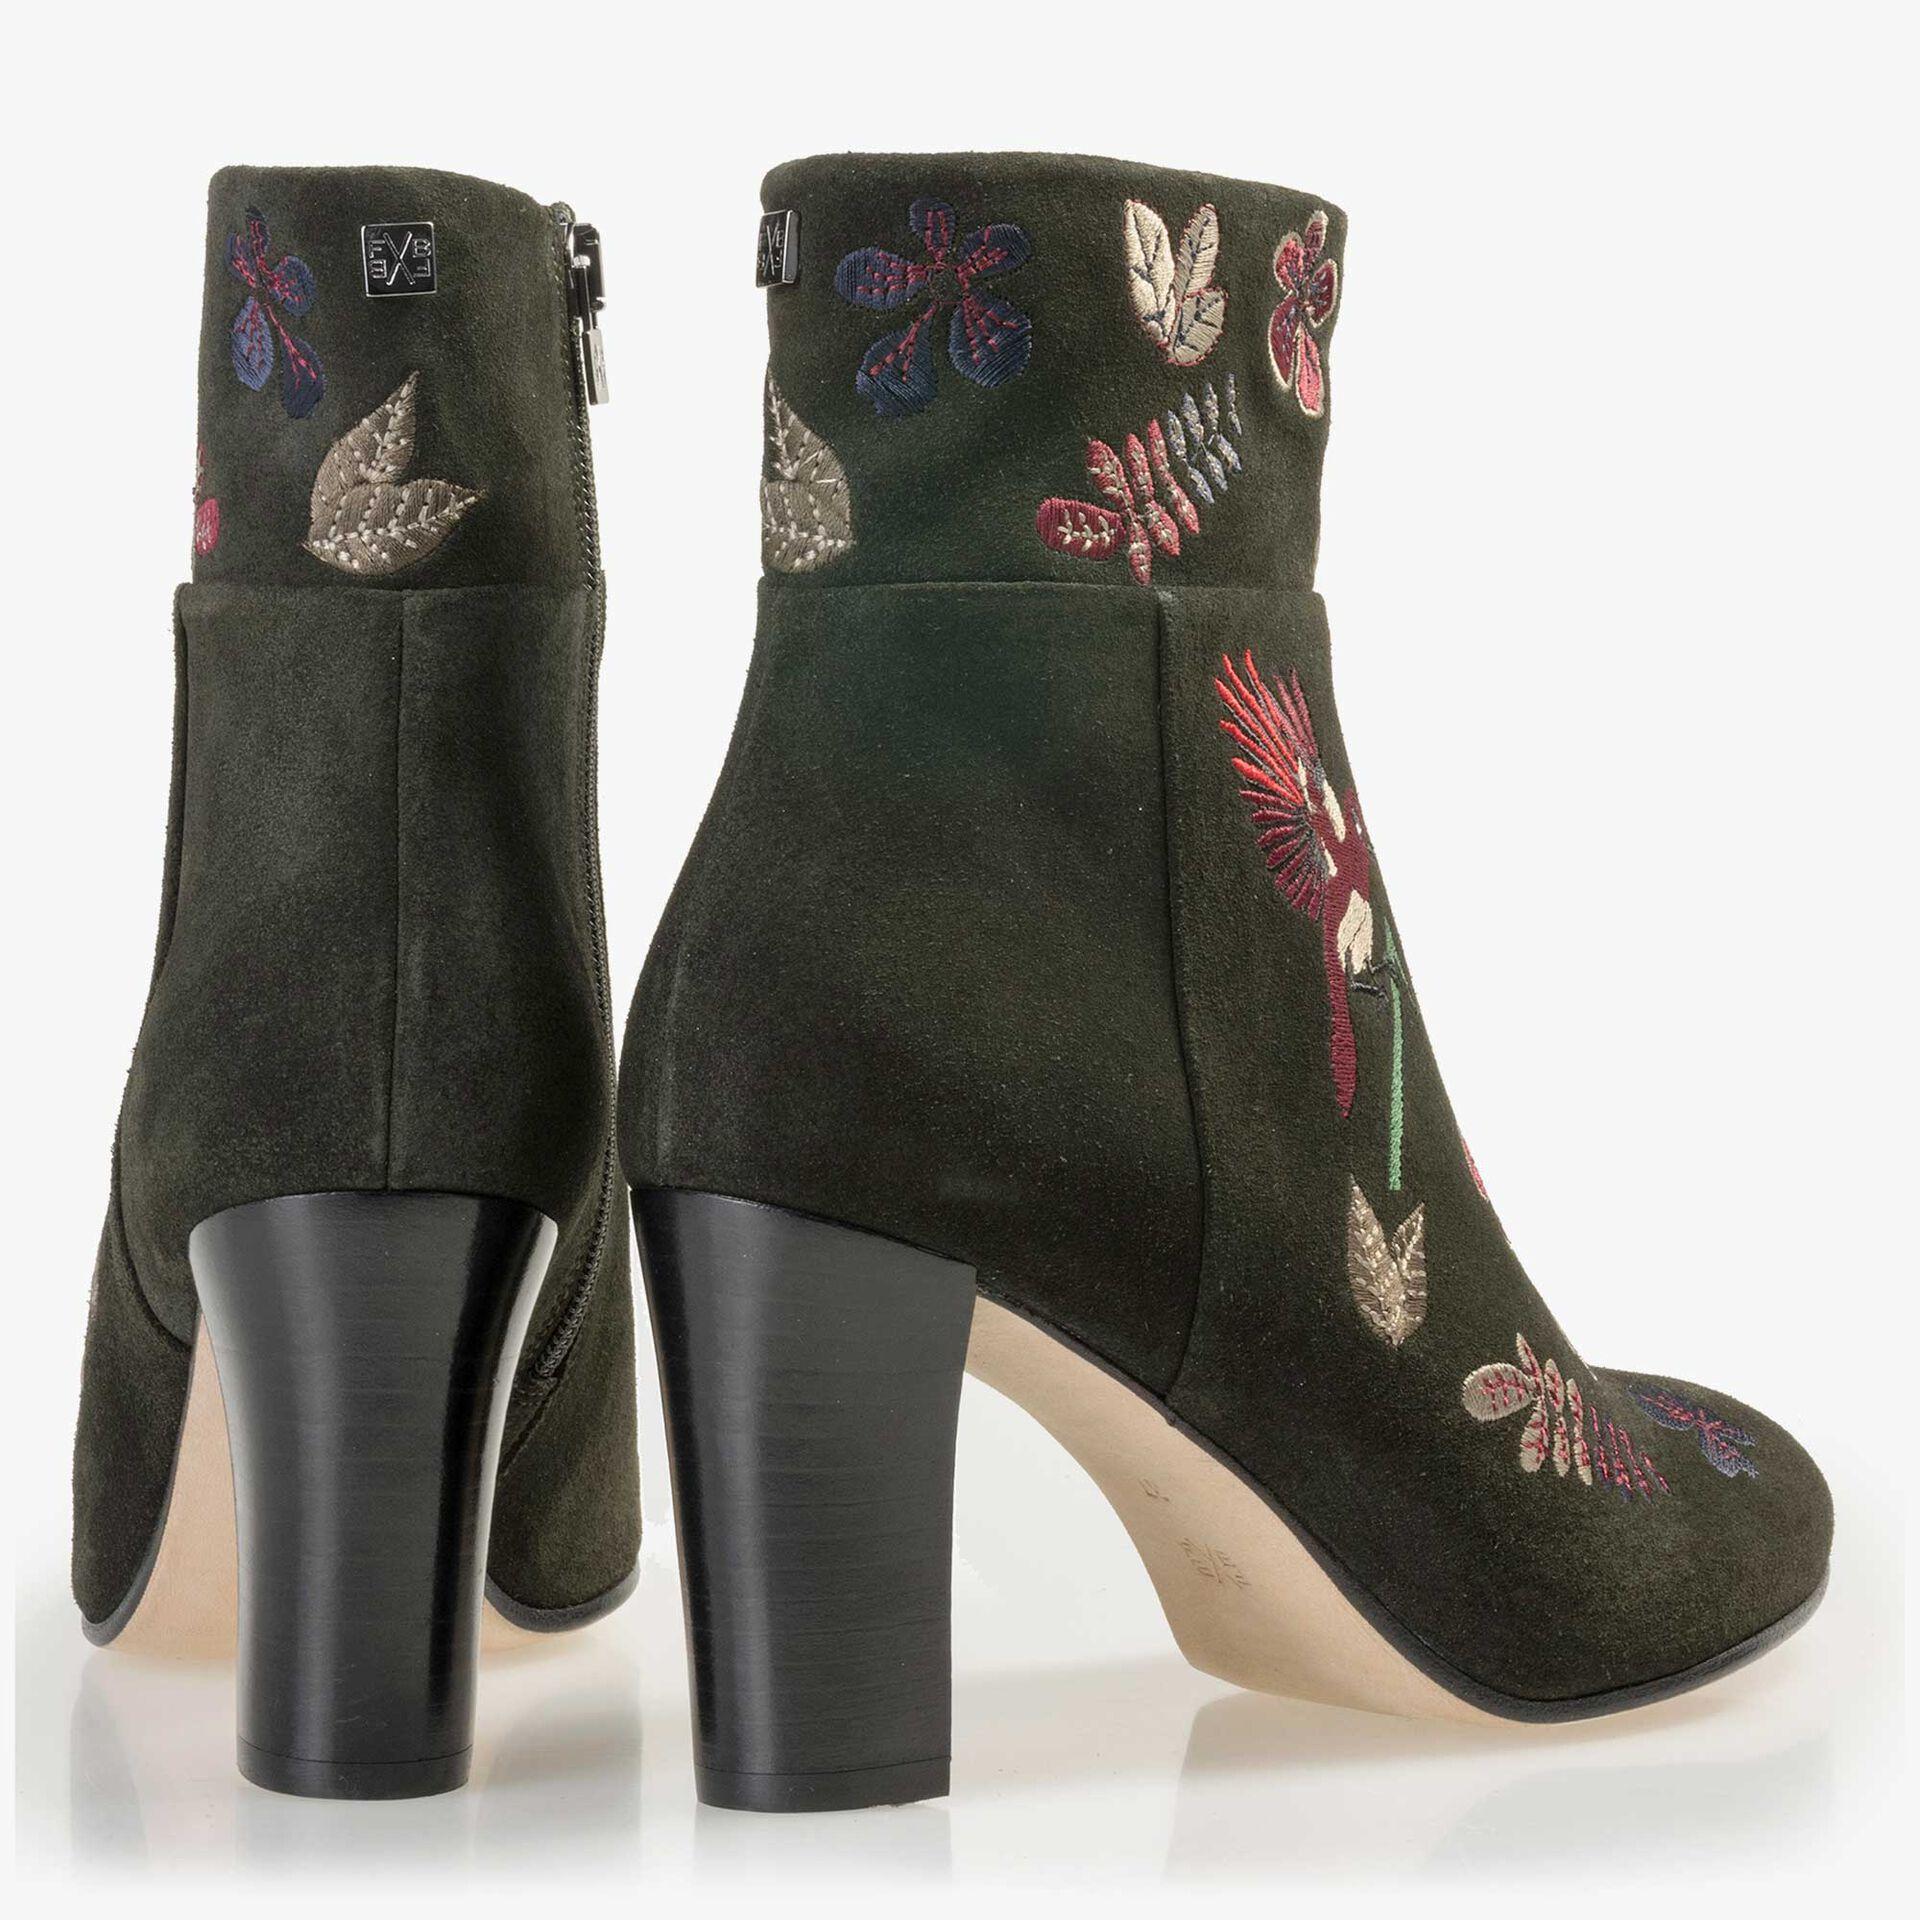 Floris van Bommel olivgrüne Wildleder Stiefelette